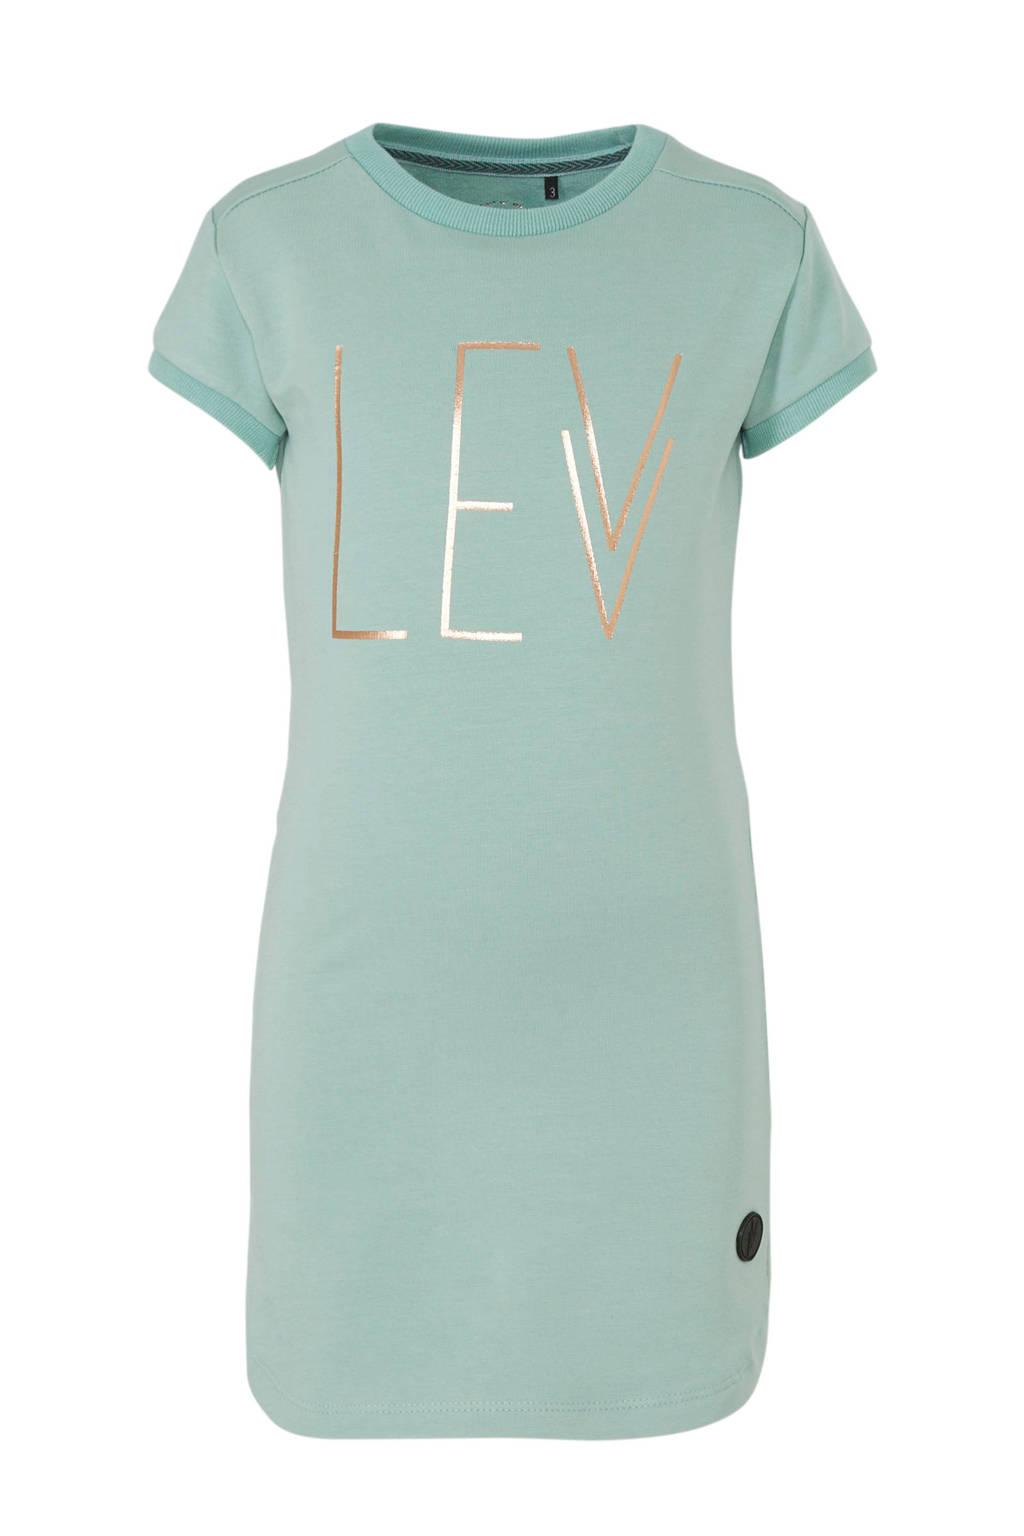 LEVV jersey jurk Gaia met printopdruk mintgroen/goud, Mintgroen/goud